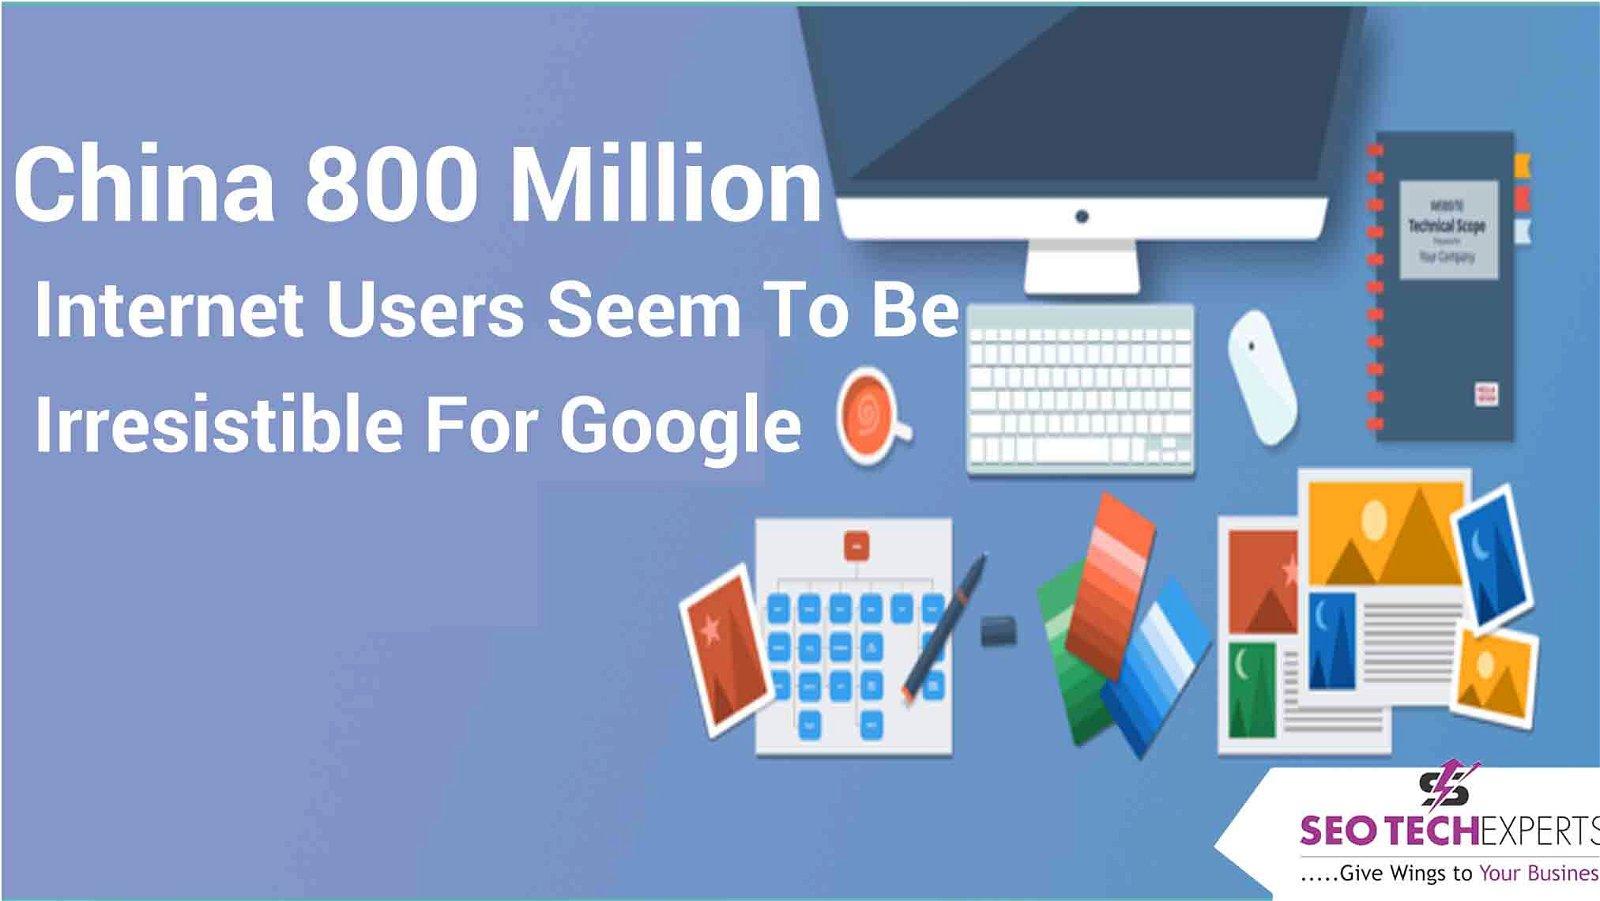 users towards Google